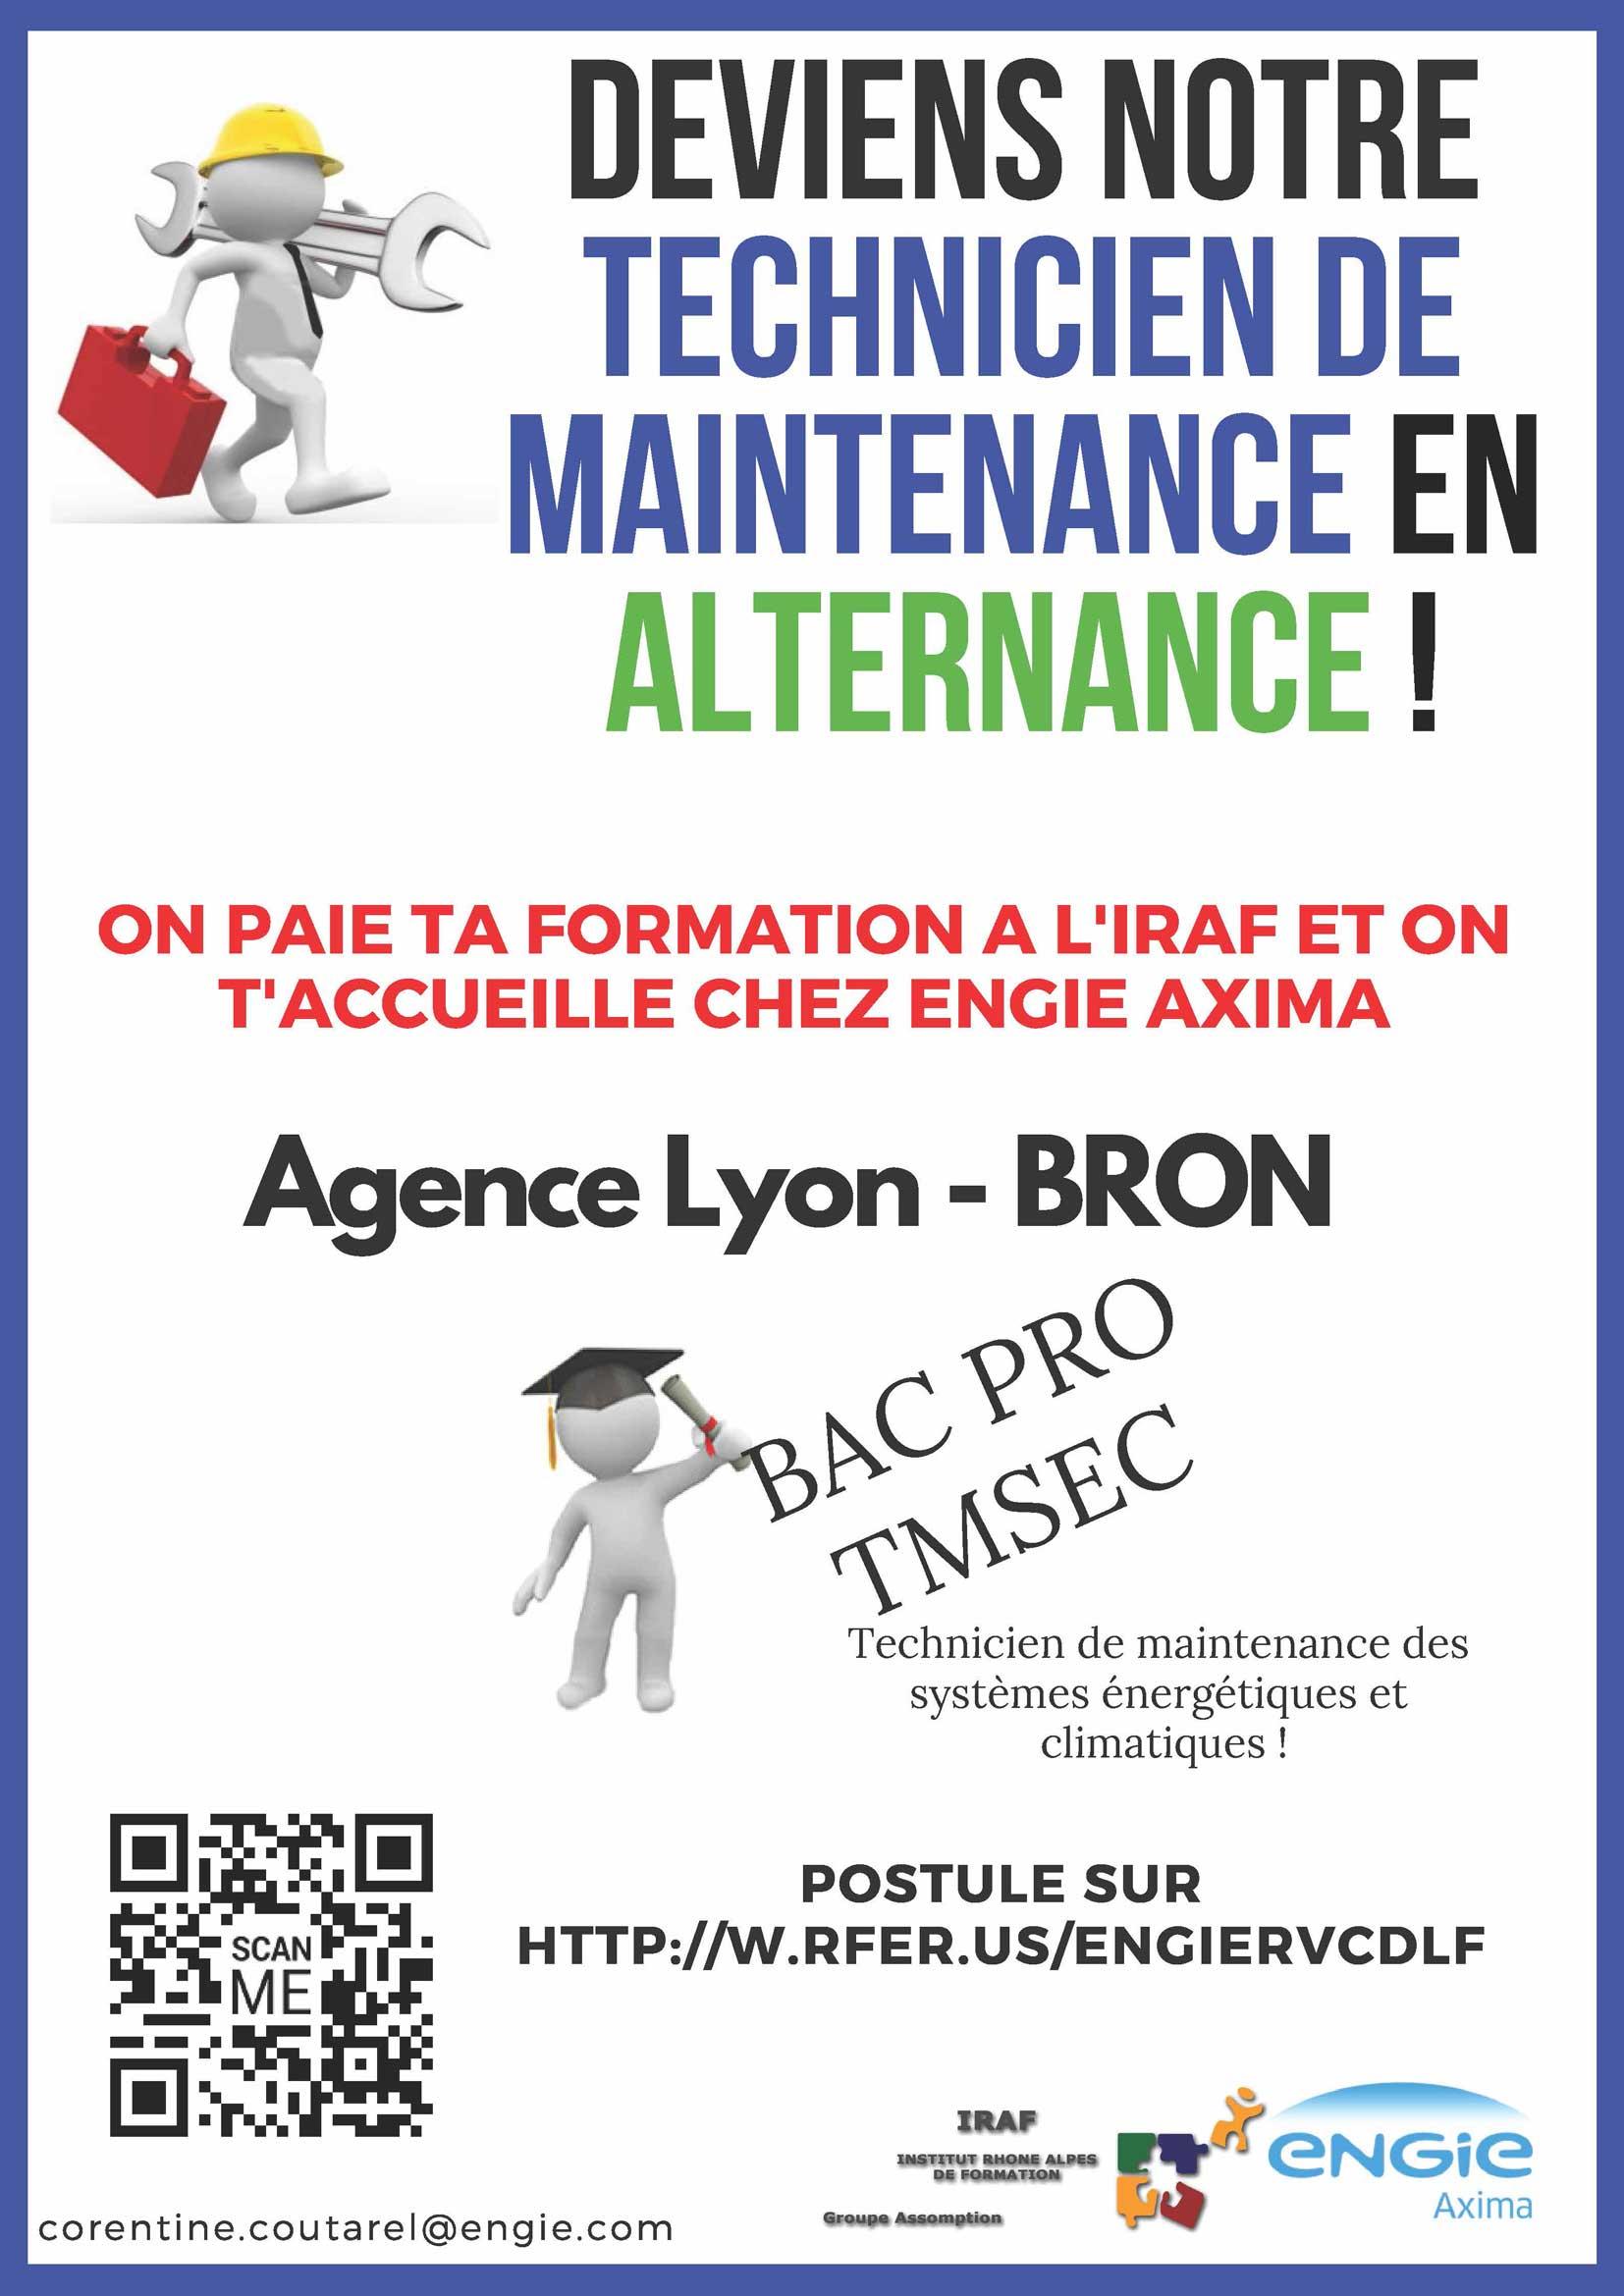 Offre Alternance BAC Pro TMSEC